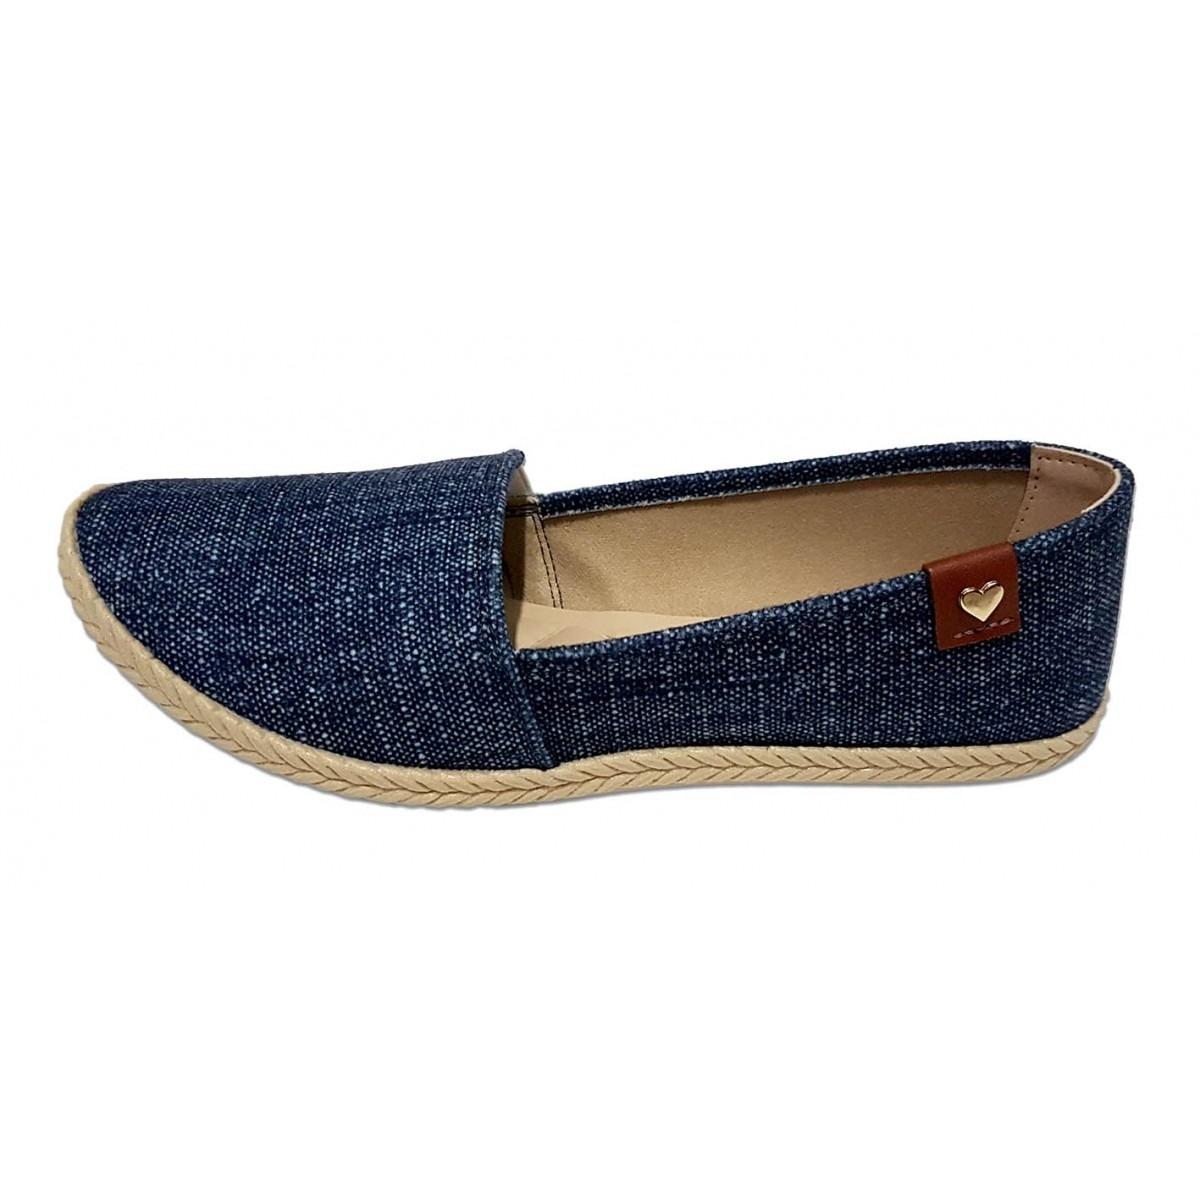 4f3cd2a725 sapatilha alpargata jeans escuro feminino moleca. Carregando zoom.